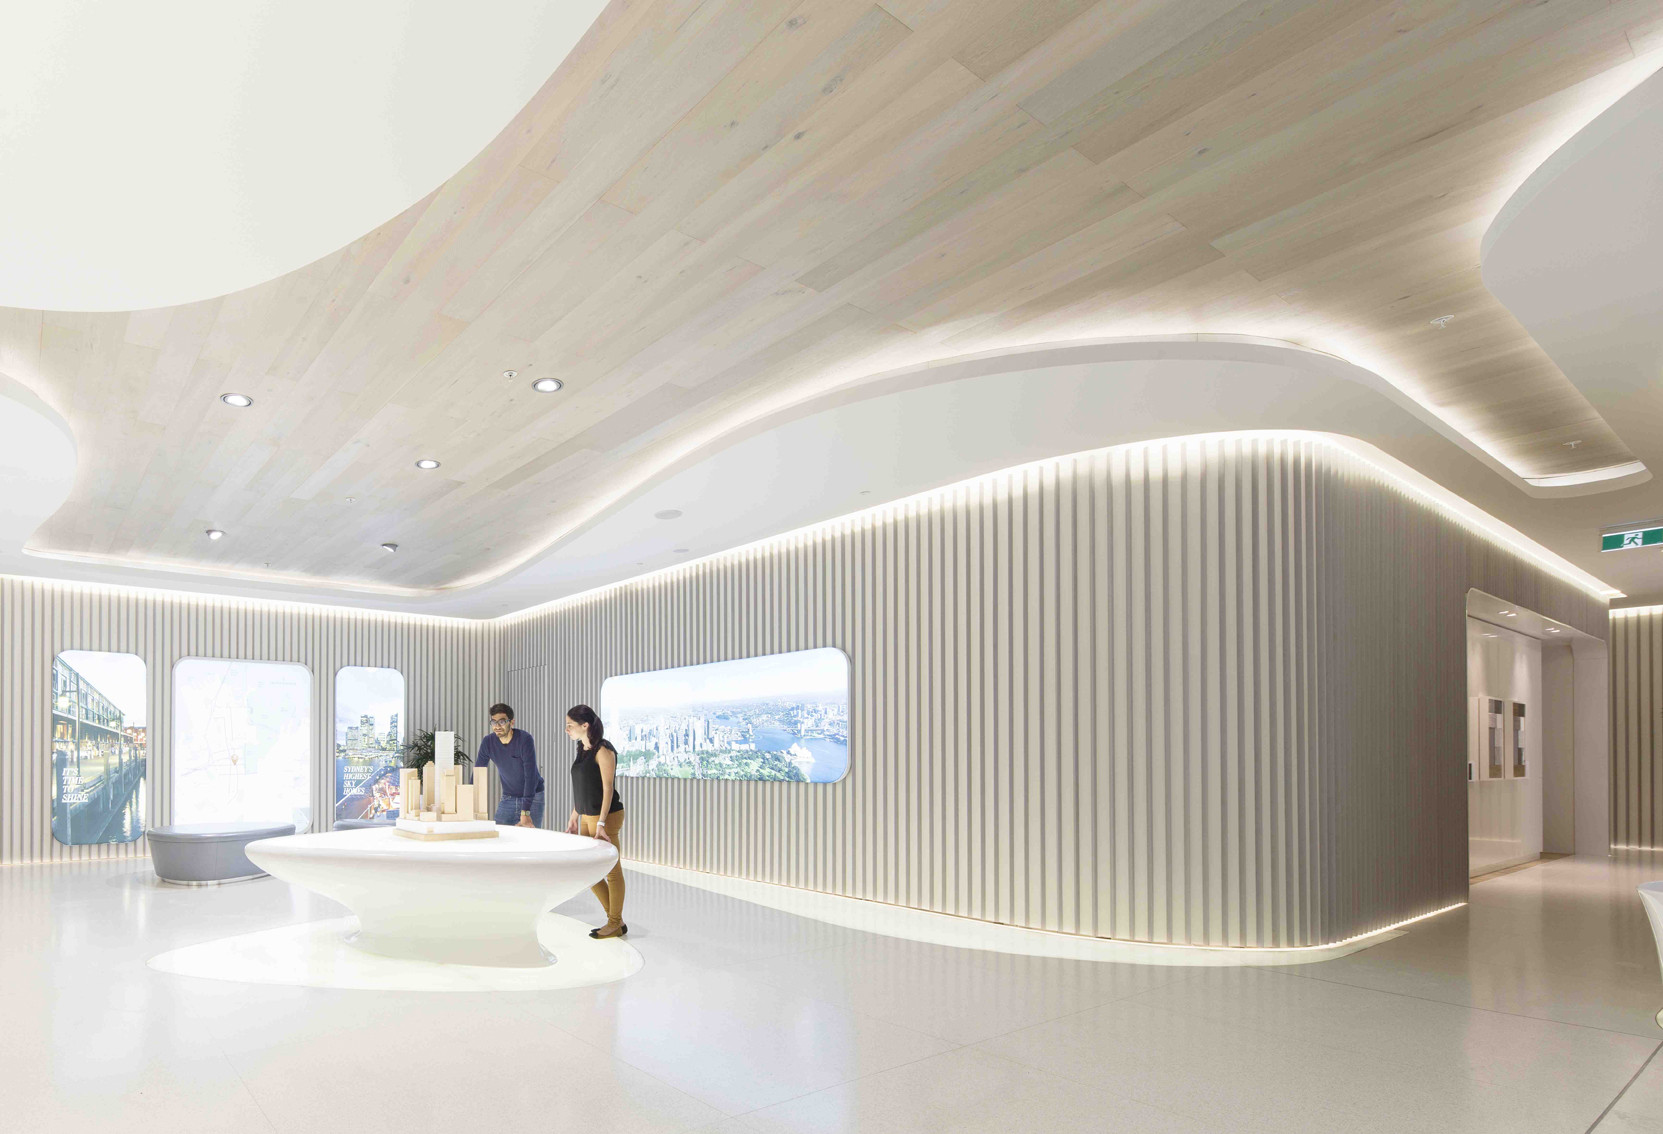 Hospital Lobby Interior Design Drawing